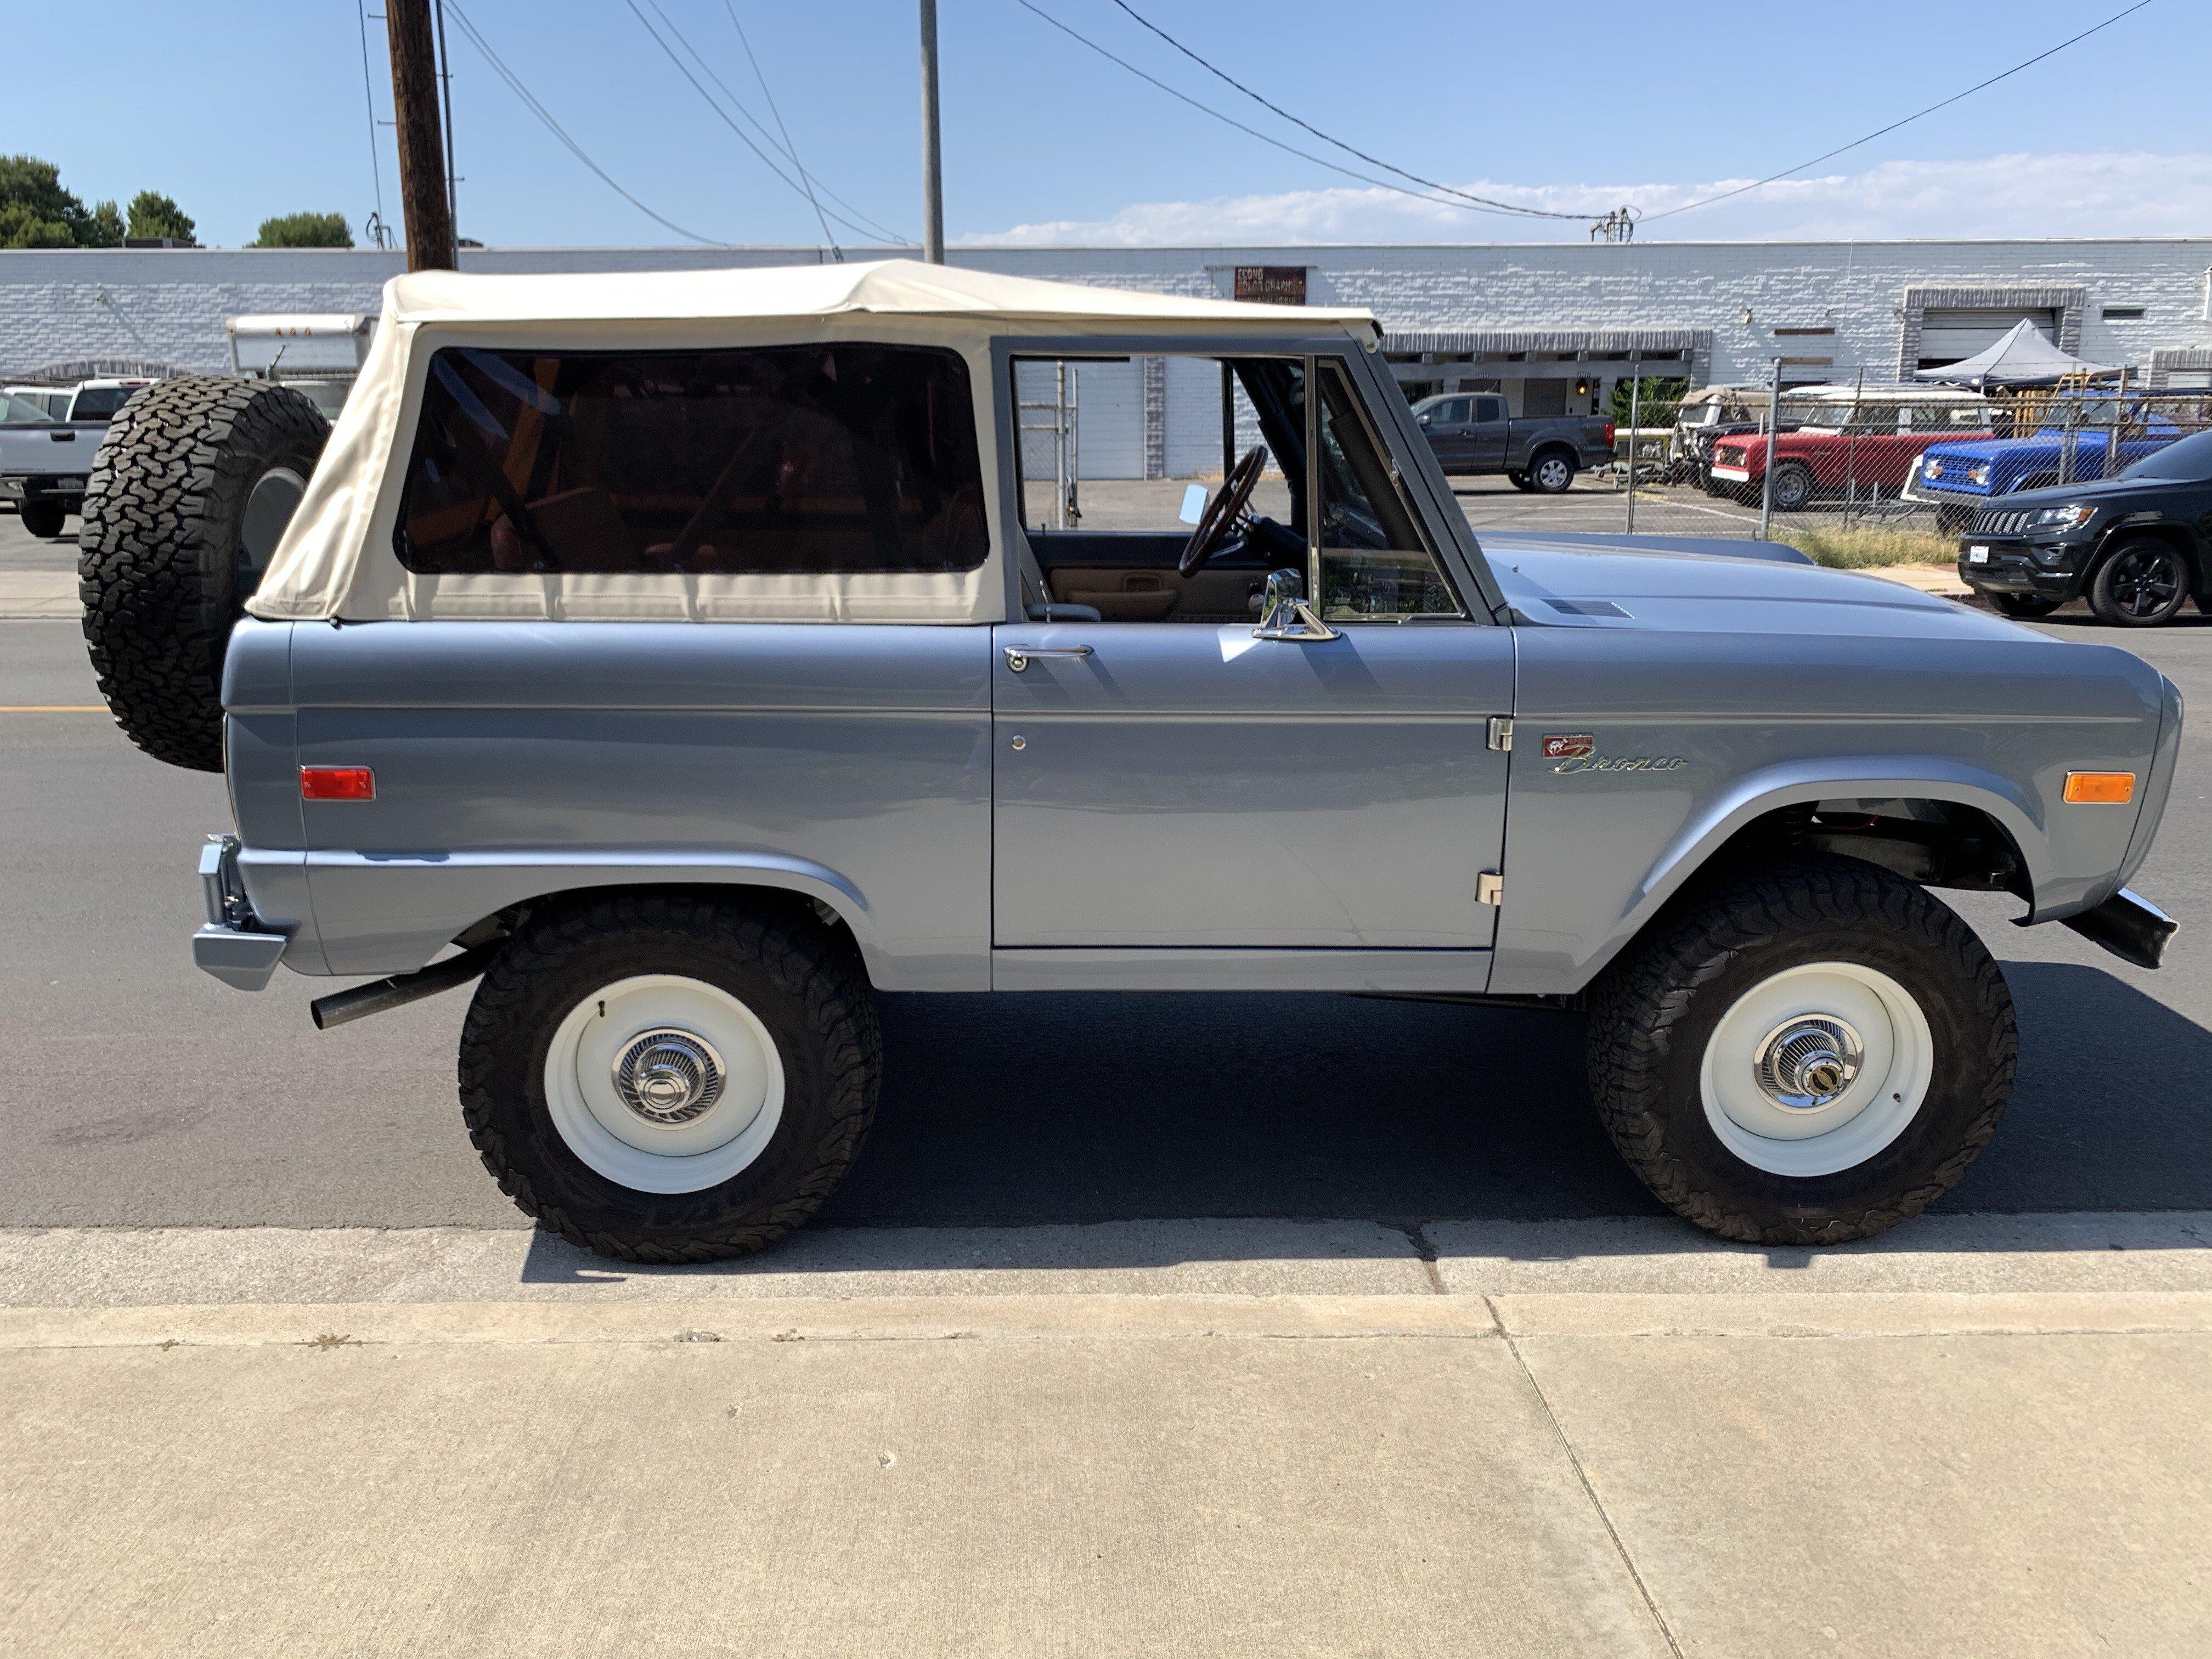 1968 Ford Bronco For Sale Near Chatsworth California 91311 Classics On Autotrader